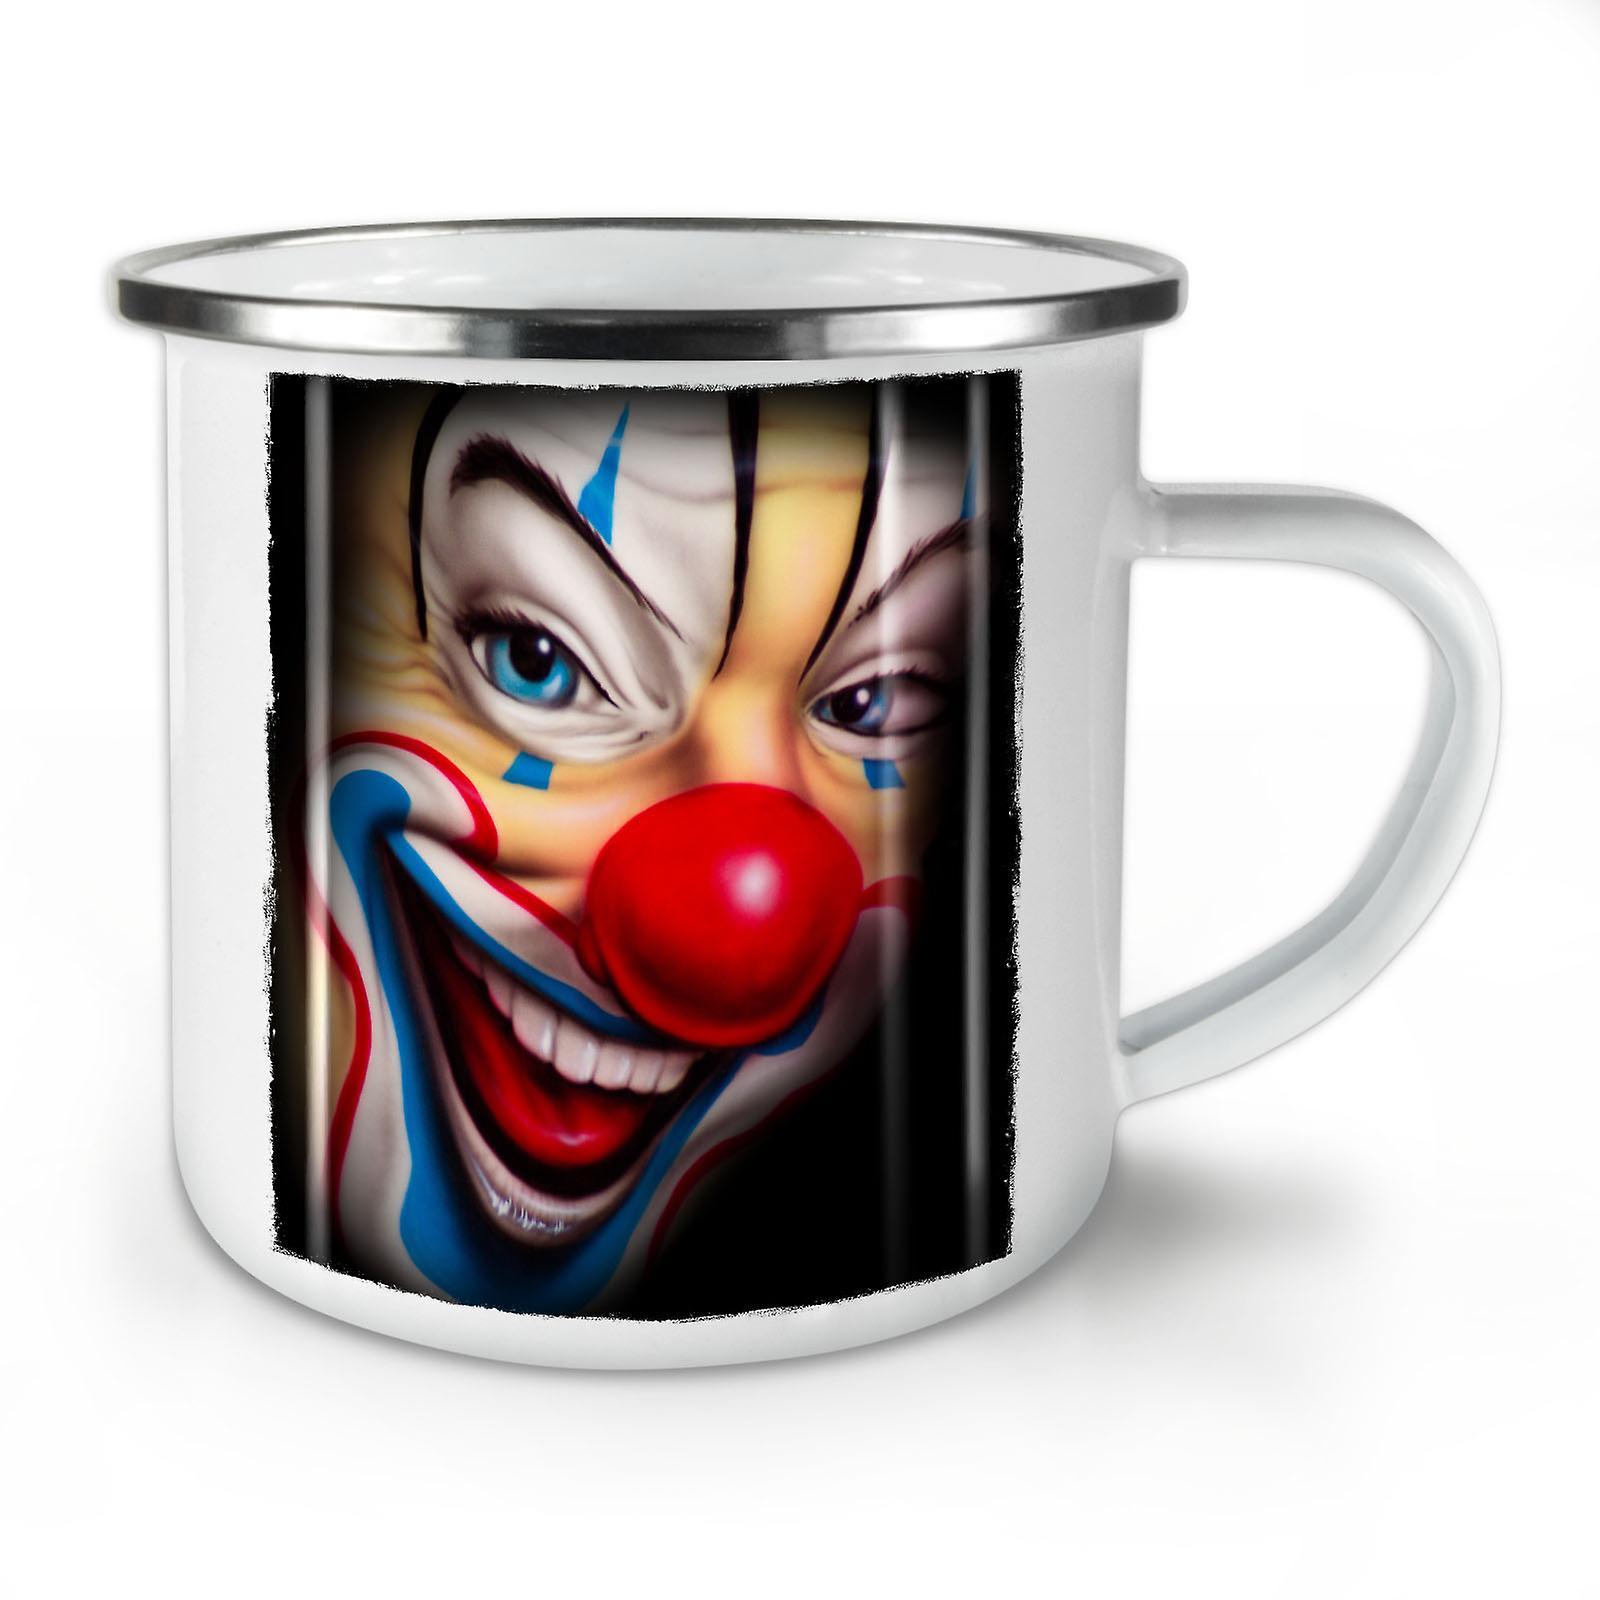 Effrayant Nouveau Whitetea Émail OzWellcoda Café Mug10 Clown KJ1Fcl